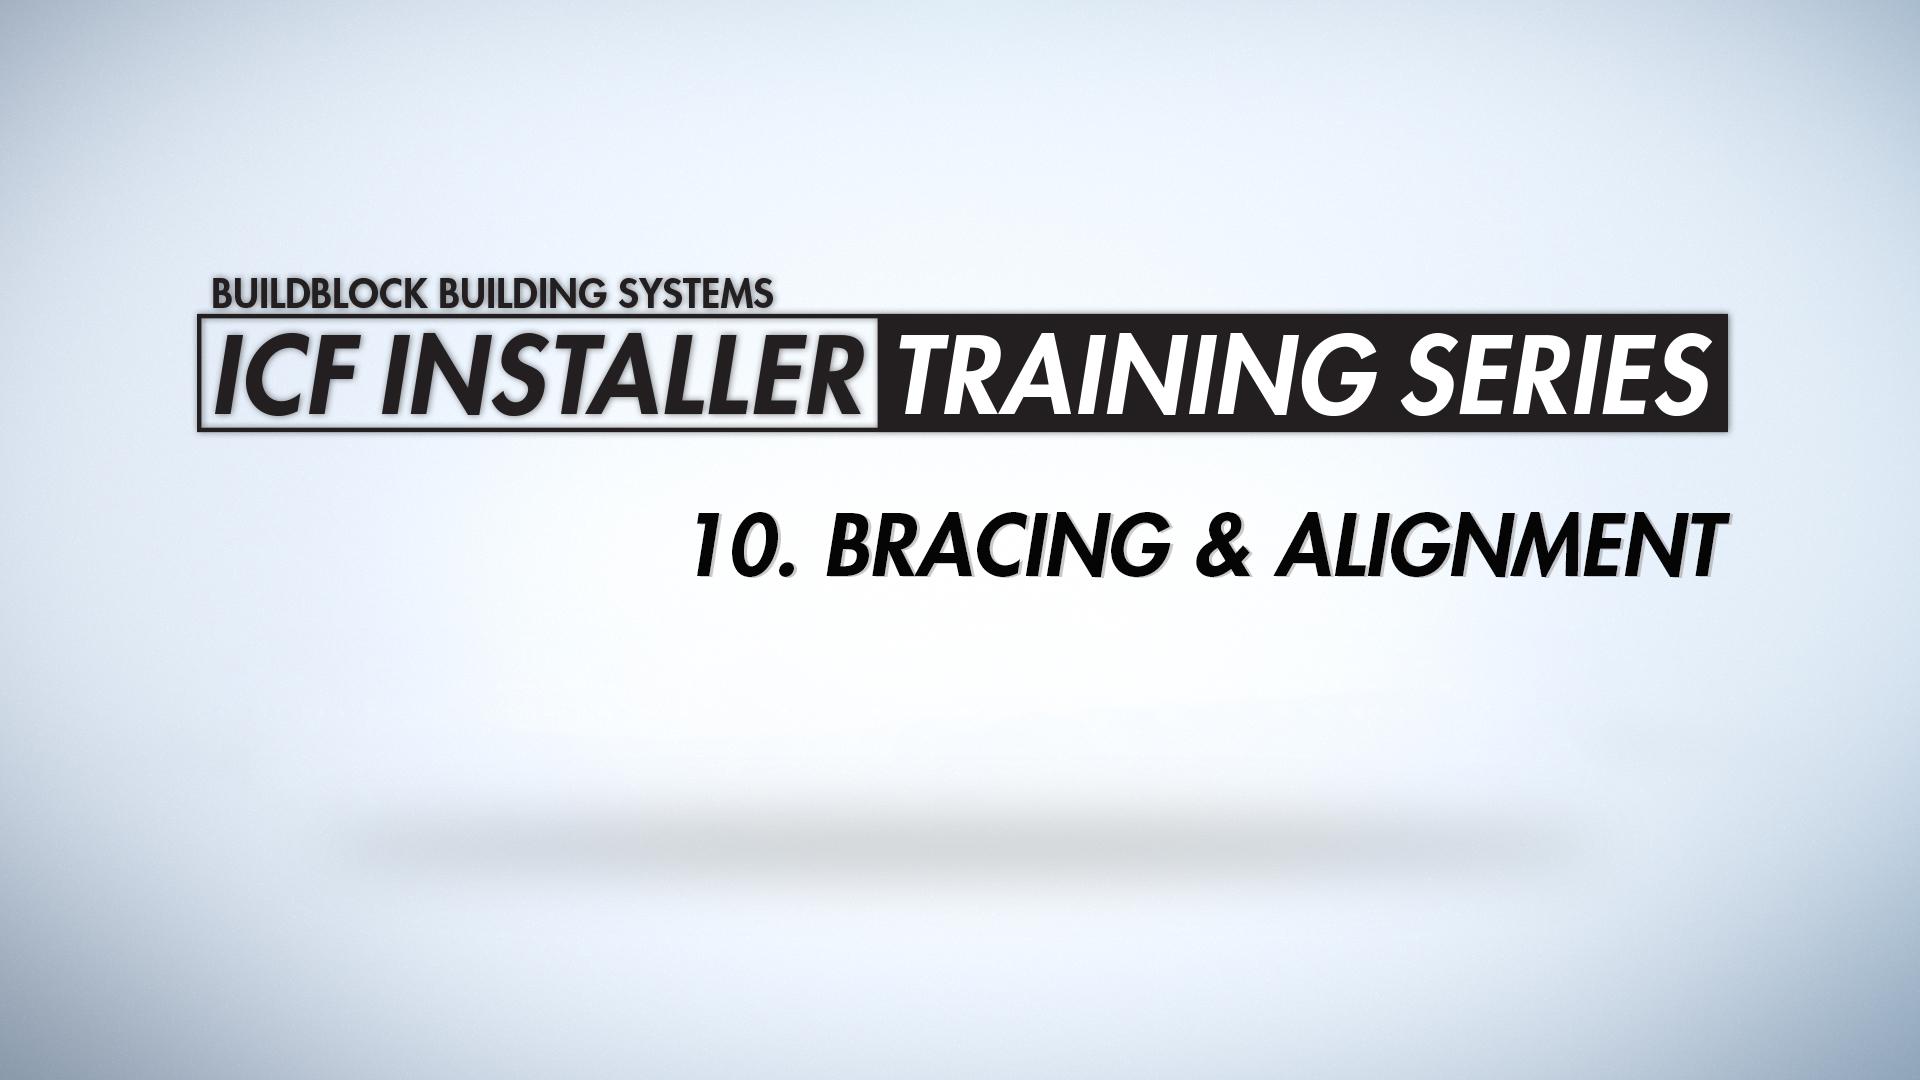 BuildBlock ICF Installer Training Series: Bracing & Alignment